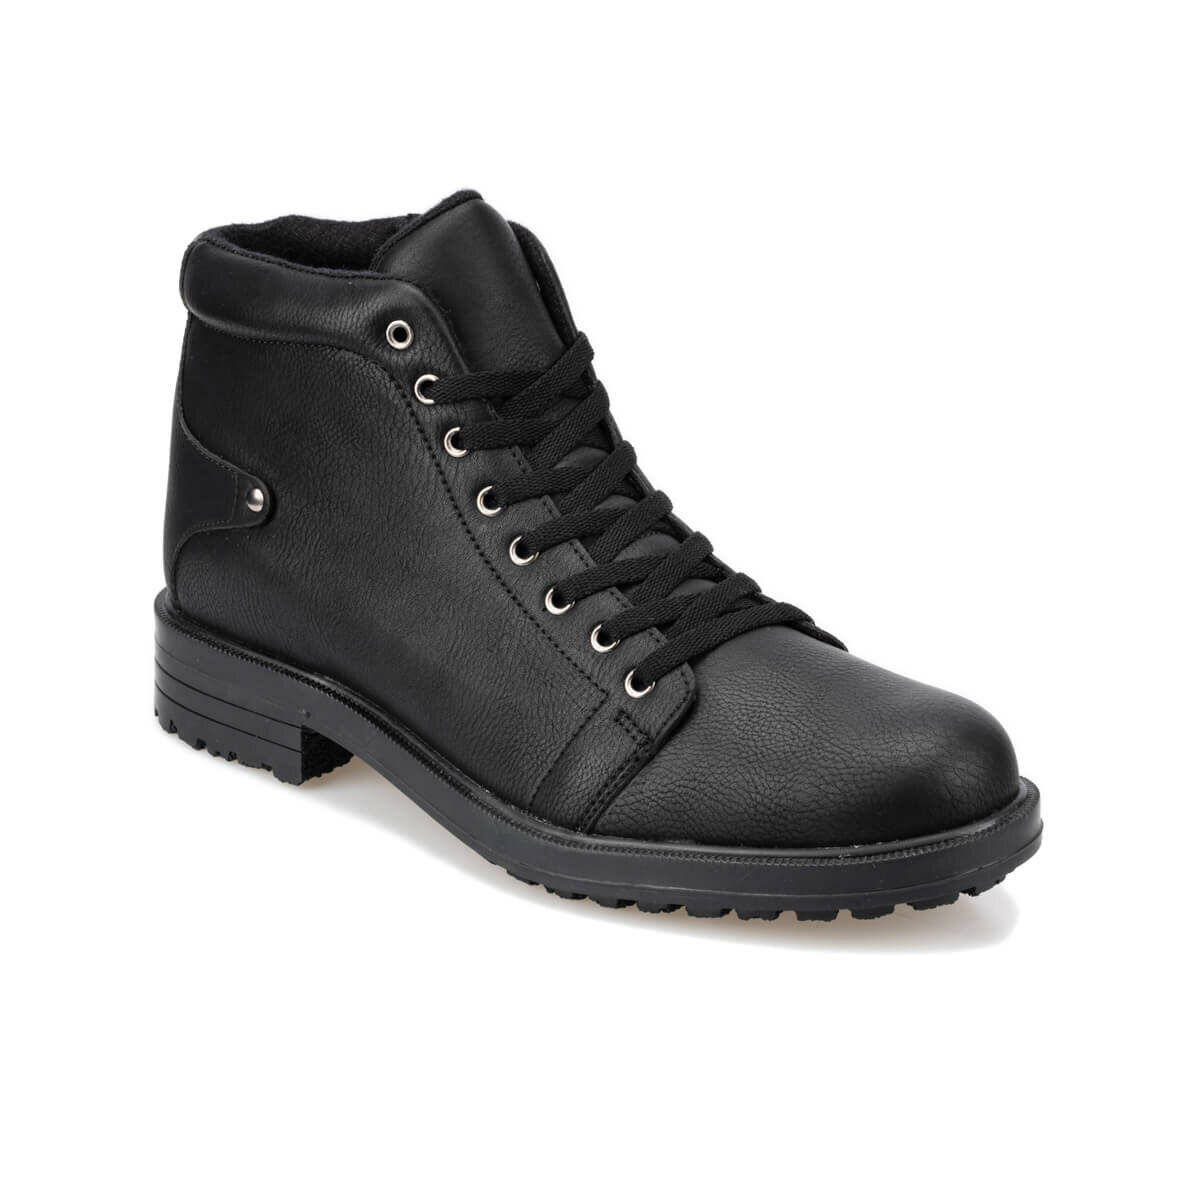 FLO 92. 150508.M Brown Men Boots Polaris